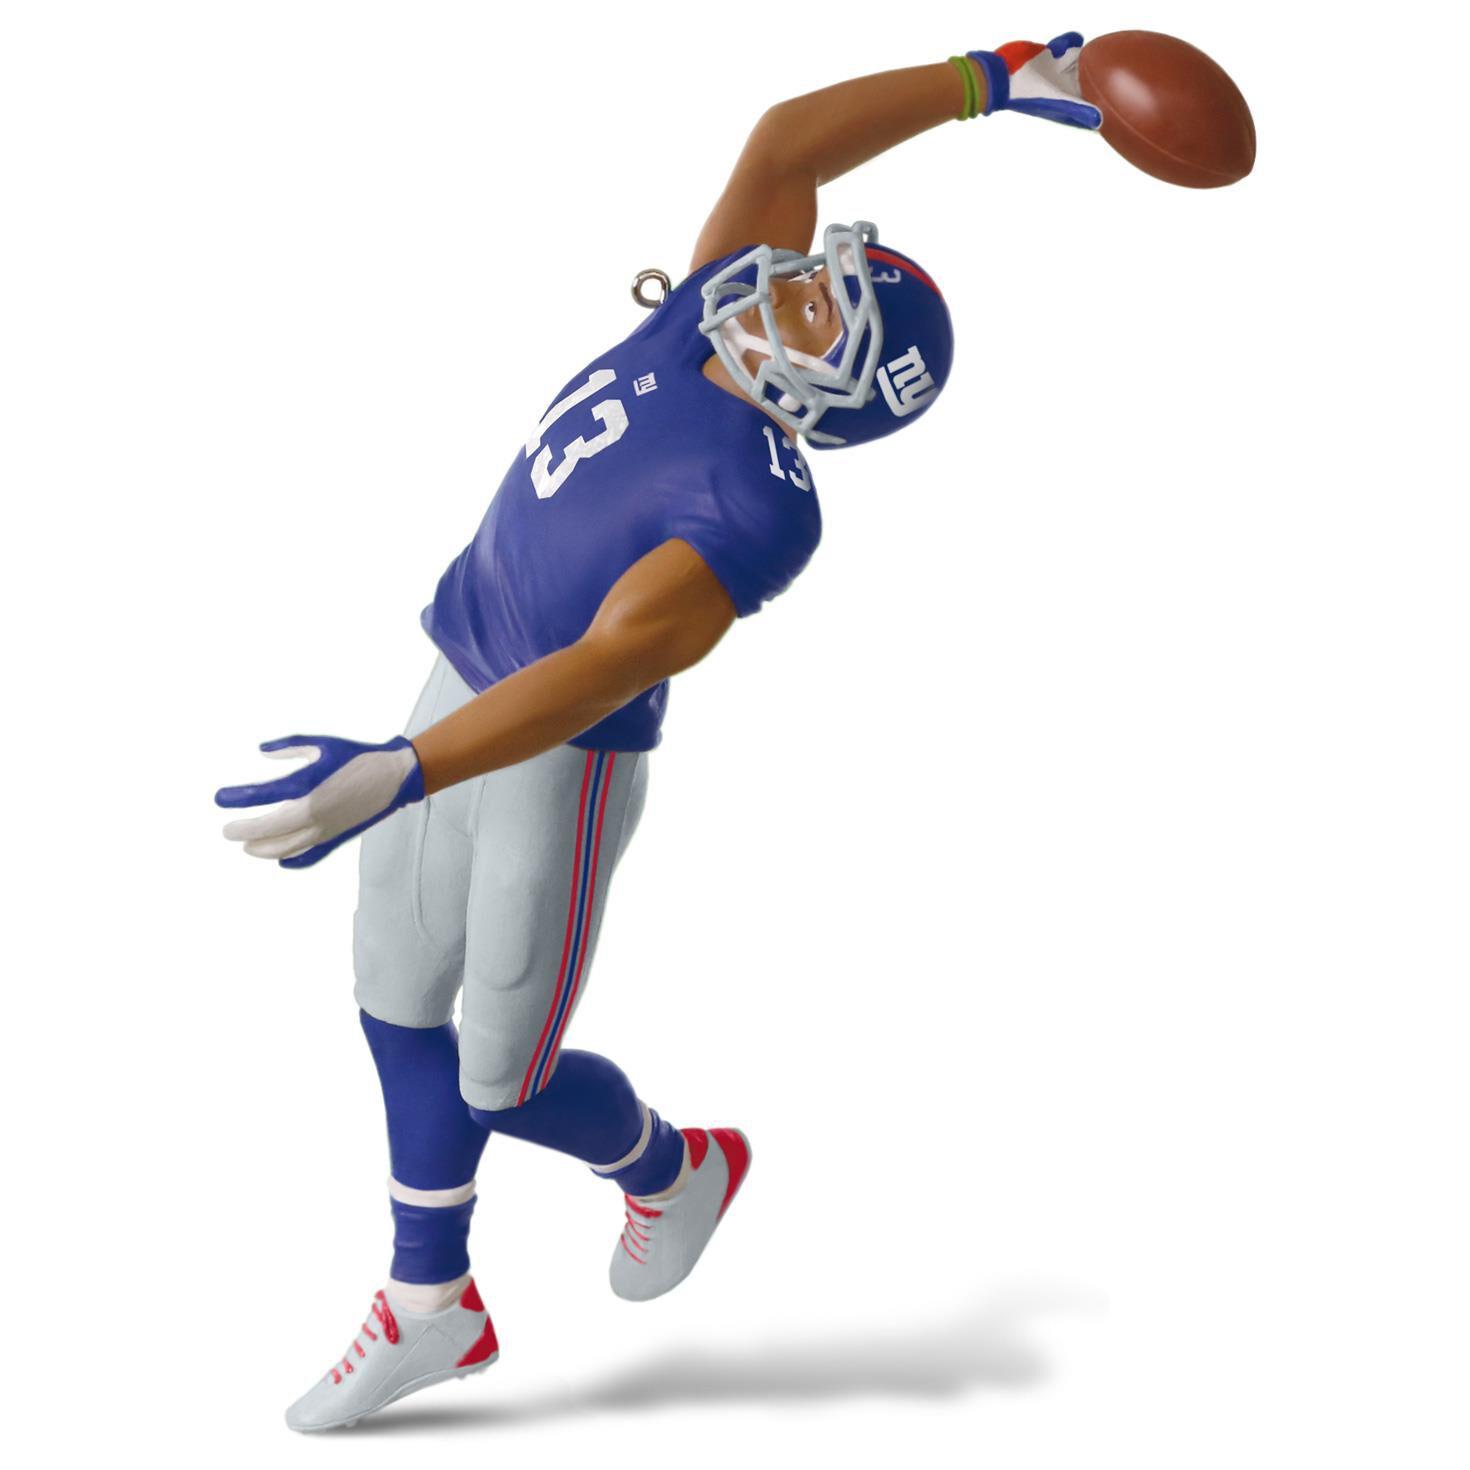 Football player ornament - Nfl New York Giants Odell Beckham Jr Ornament Keepsake Ornaments Hallmark